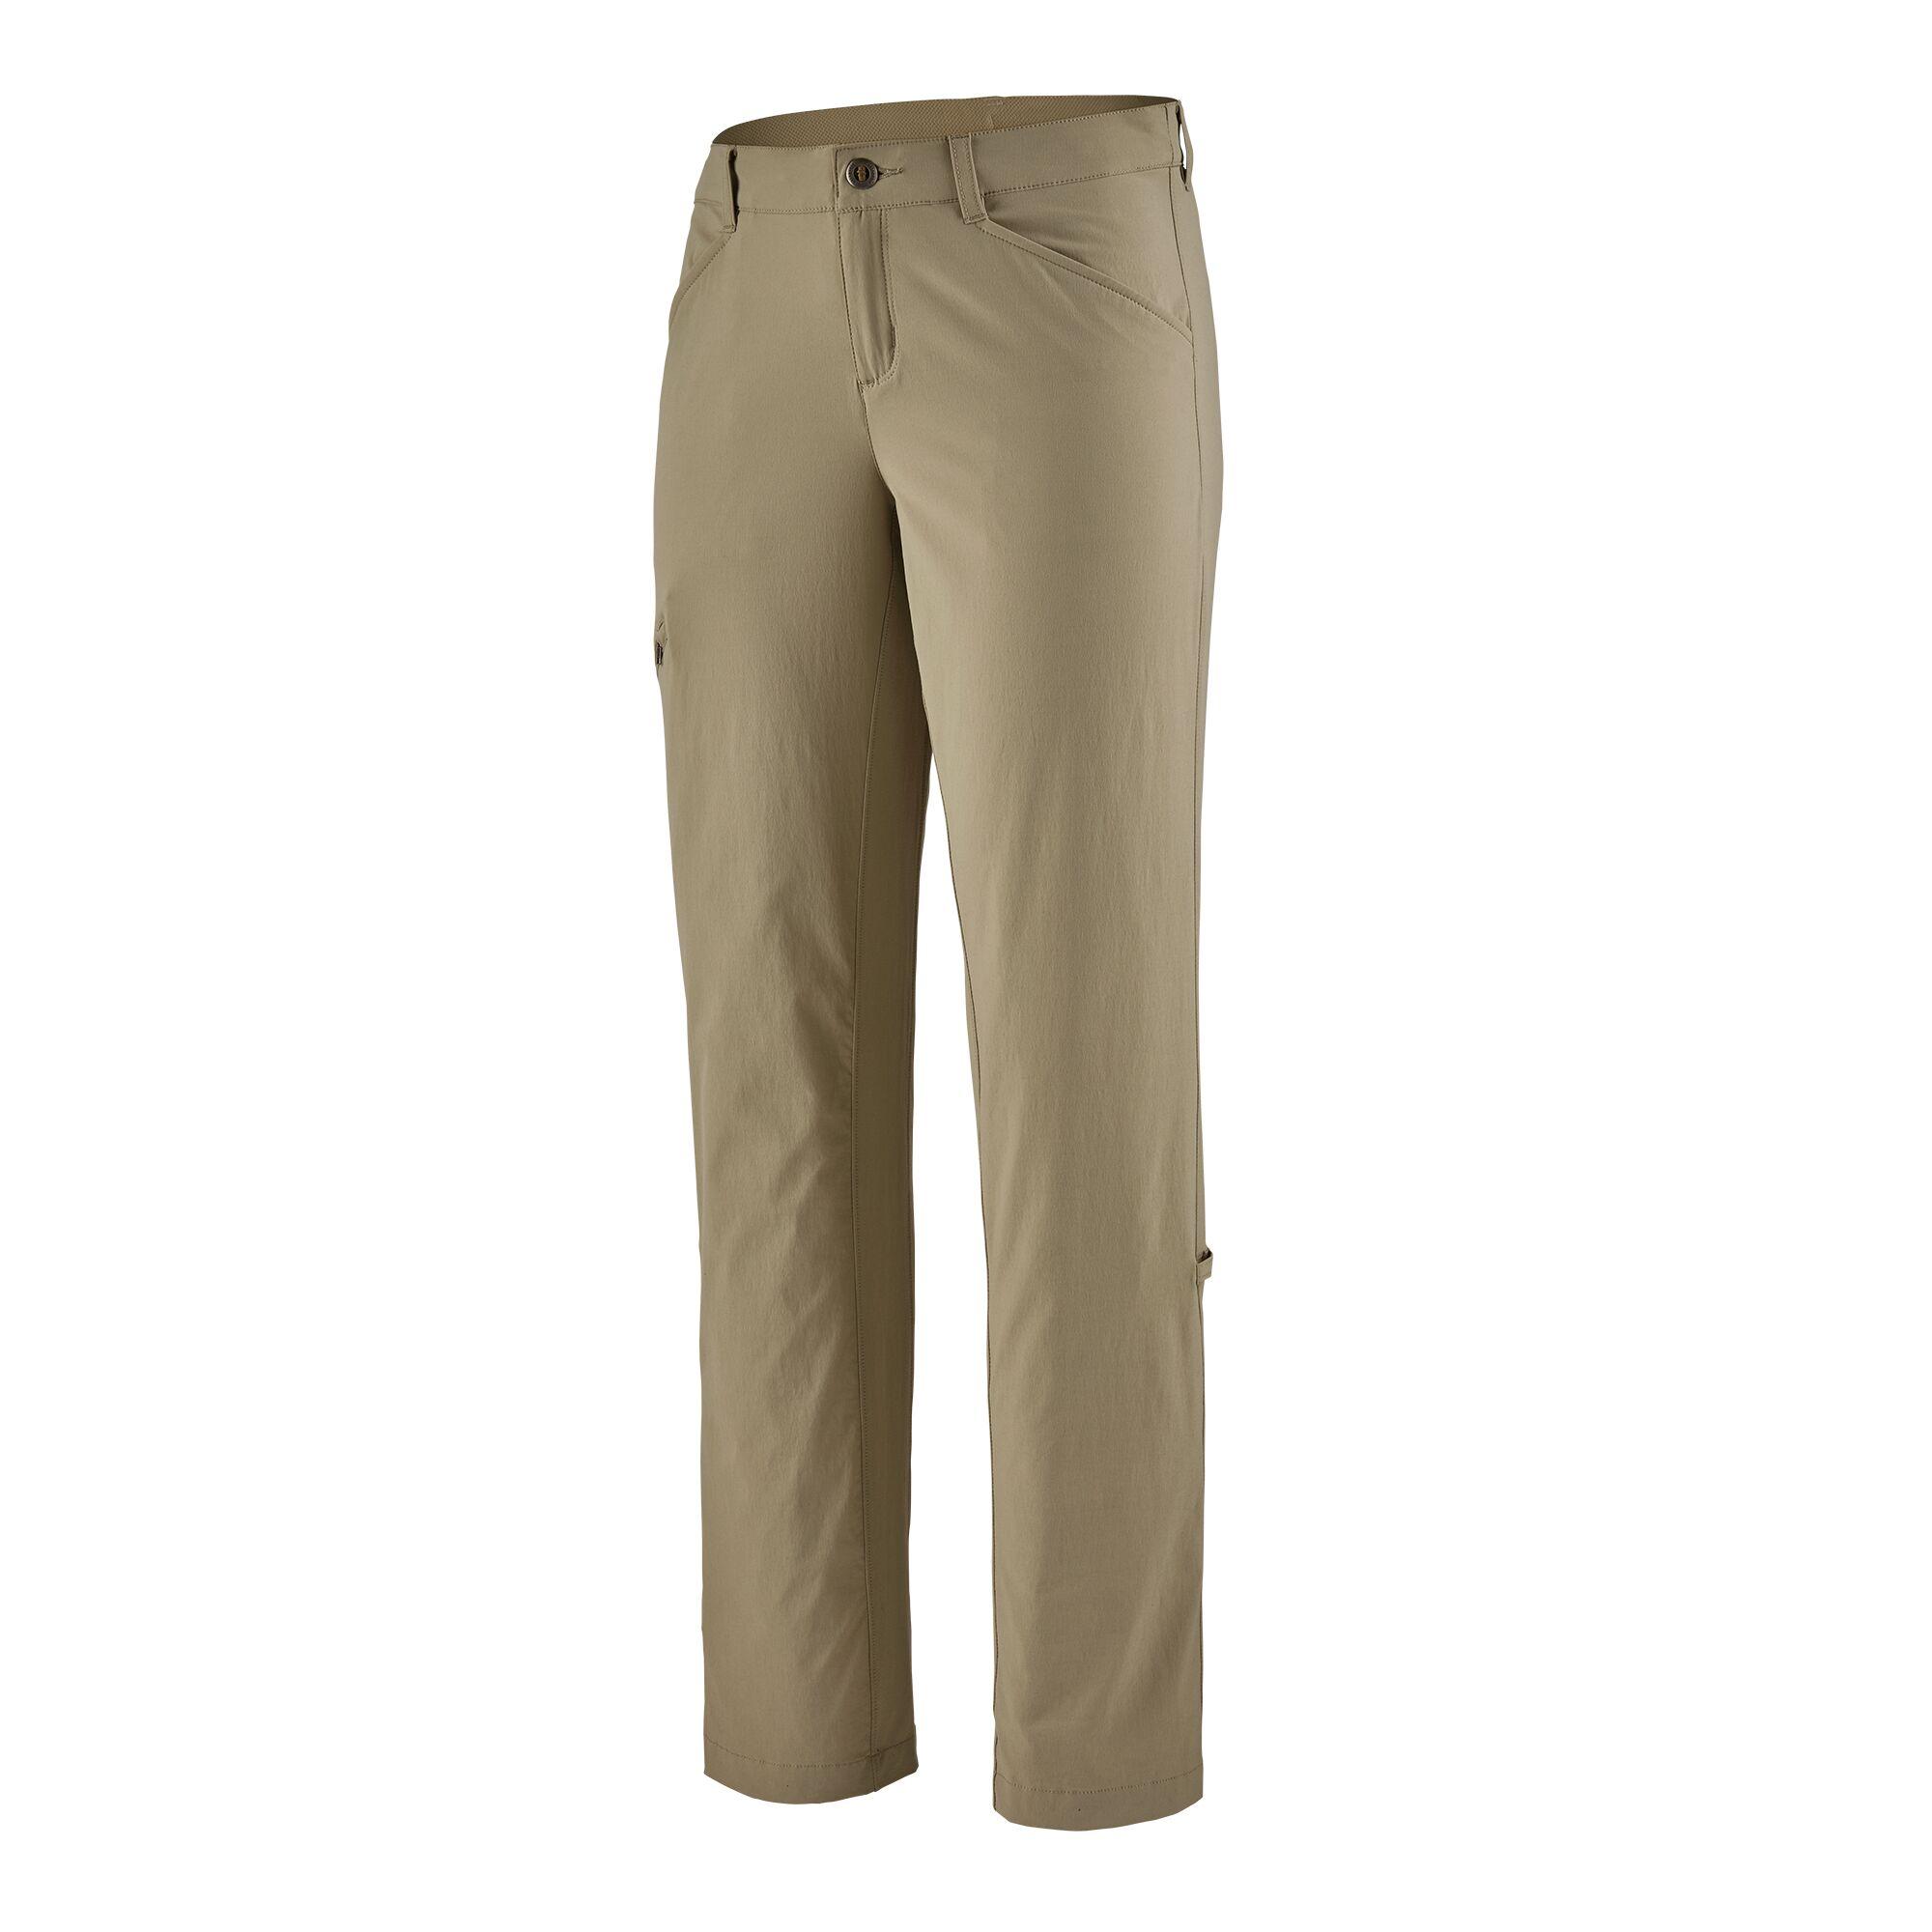 Patagonia - Quandary Pants - Walking trousers - Women's